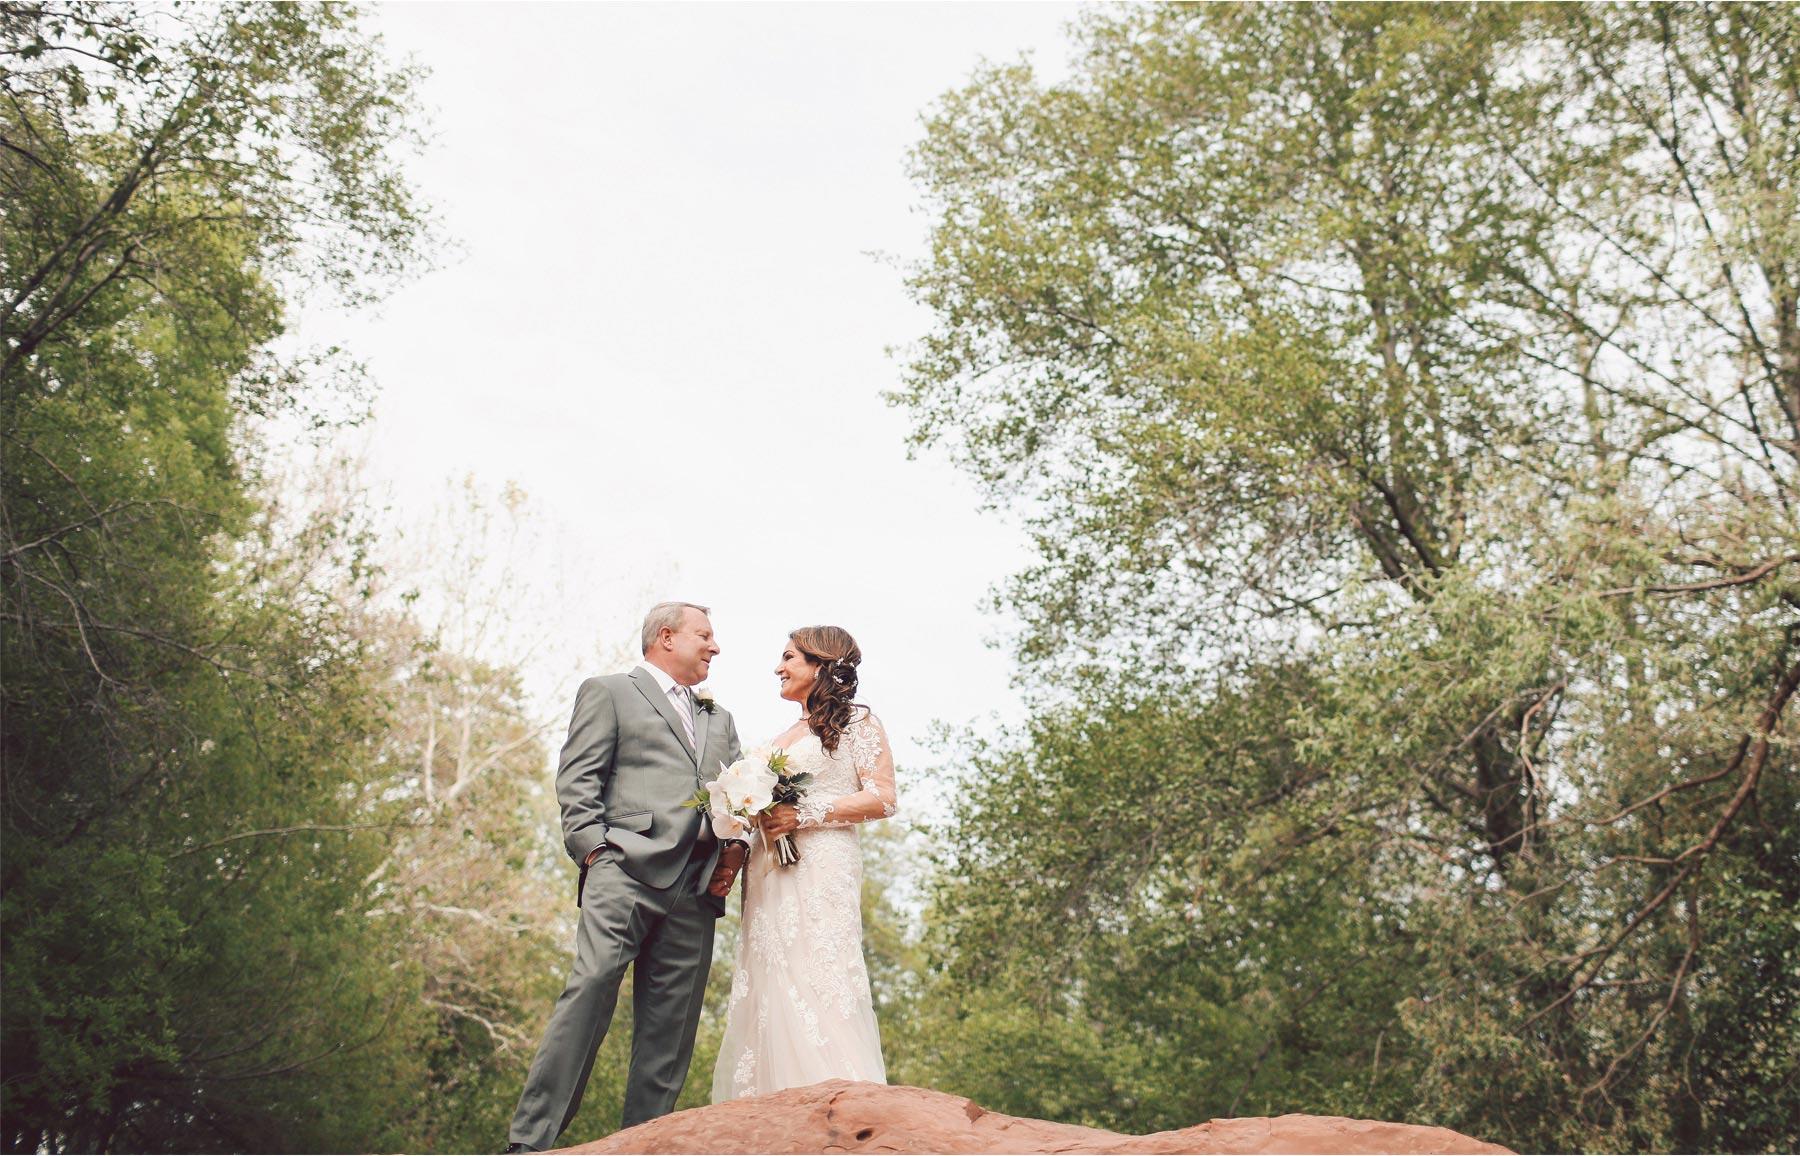 15-Sedona-Arizona-Wedding-Photographer-by-Andrew-Vick-Photography-Spring--LAuberge-de-Sedona-Resort-First-Meeting-Look-Bride-Groom-Creek-Vintage-Barbara-and-Mike.jpg